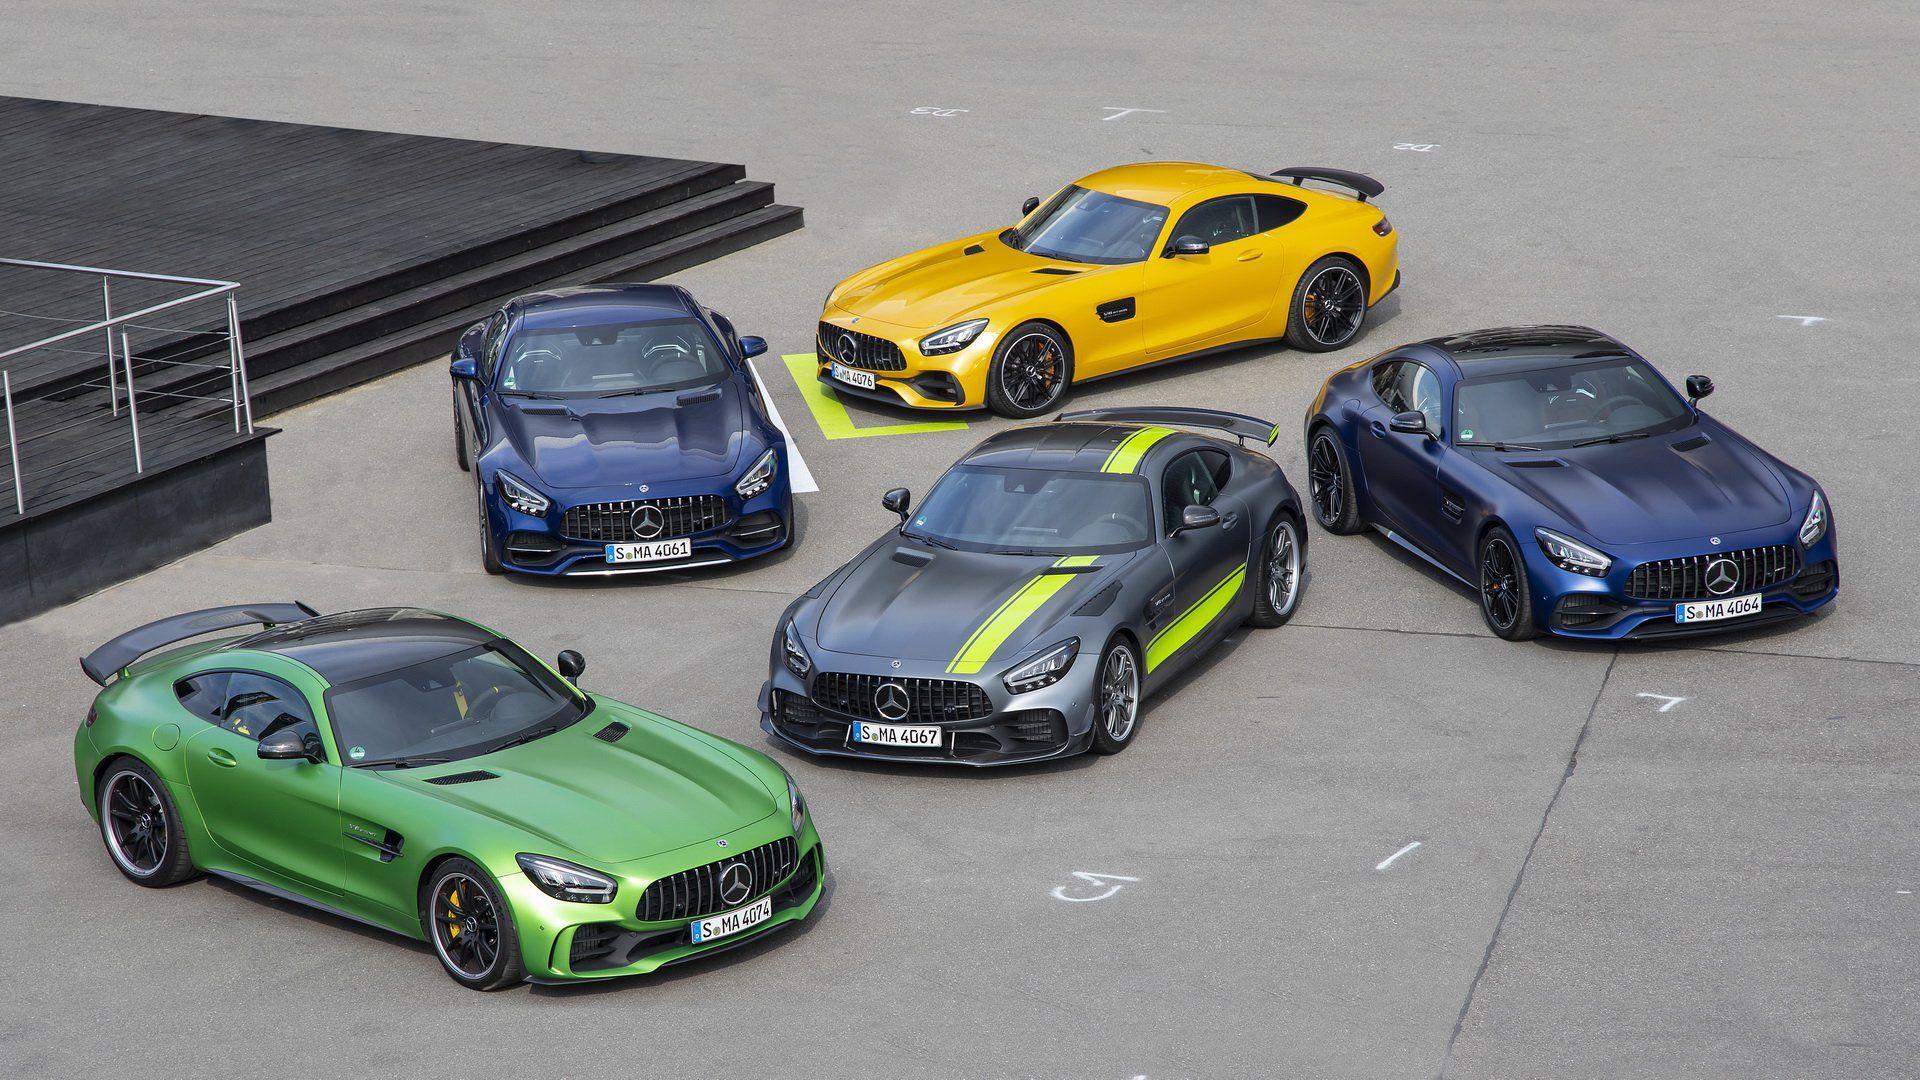 Mercedes Details 2020 Amg Gt R Pro Along With Updated Range Carscoops Mercedes Amg Mercedes Benz Amg Mercedes Car